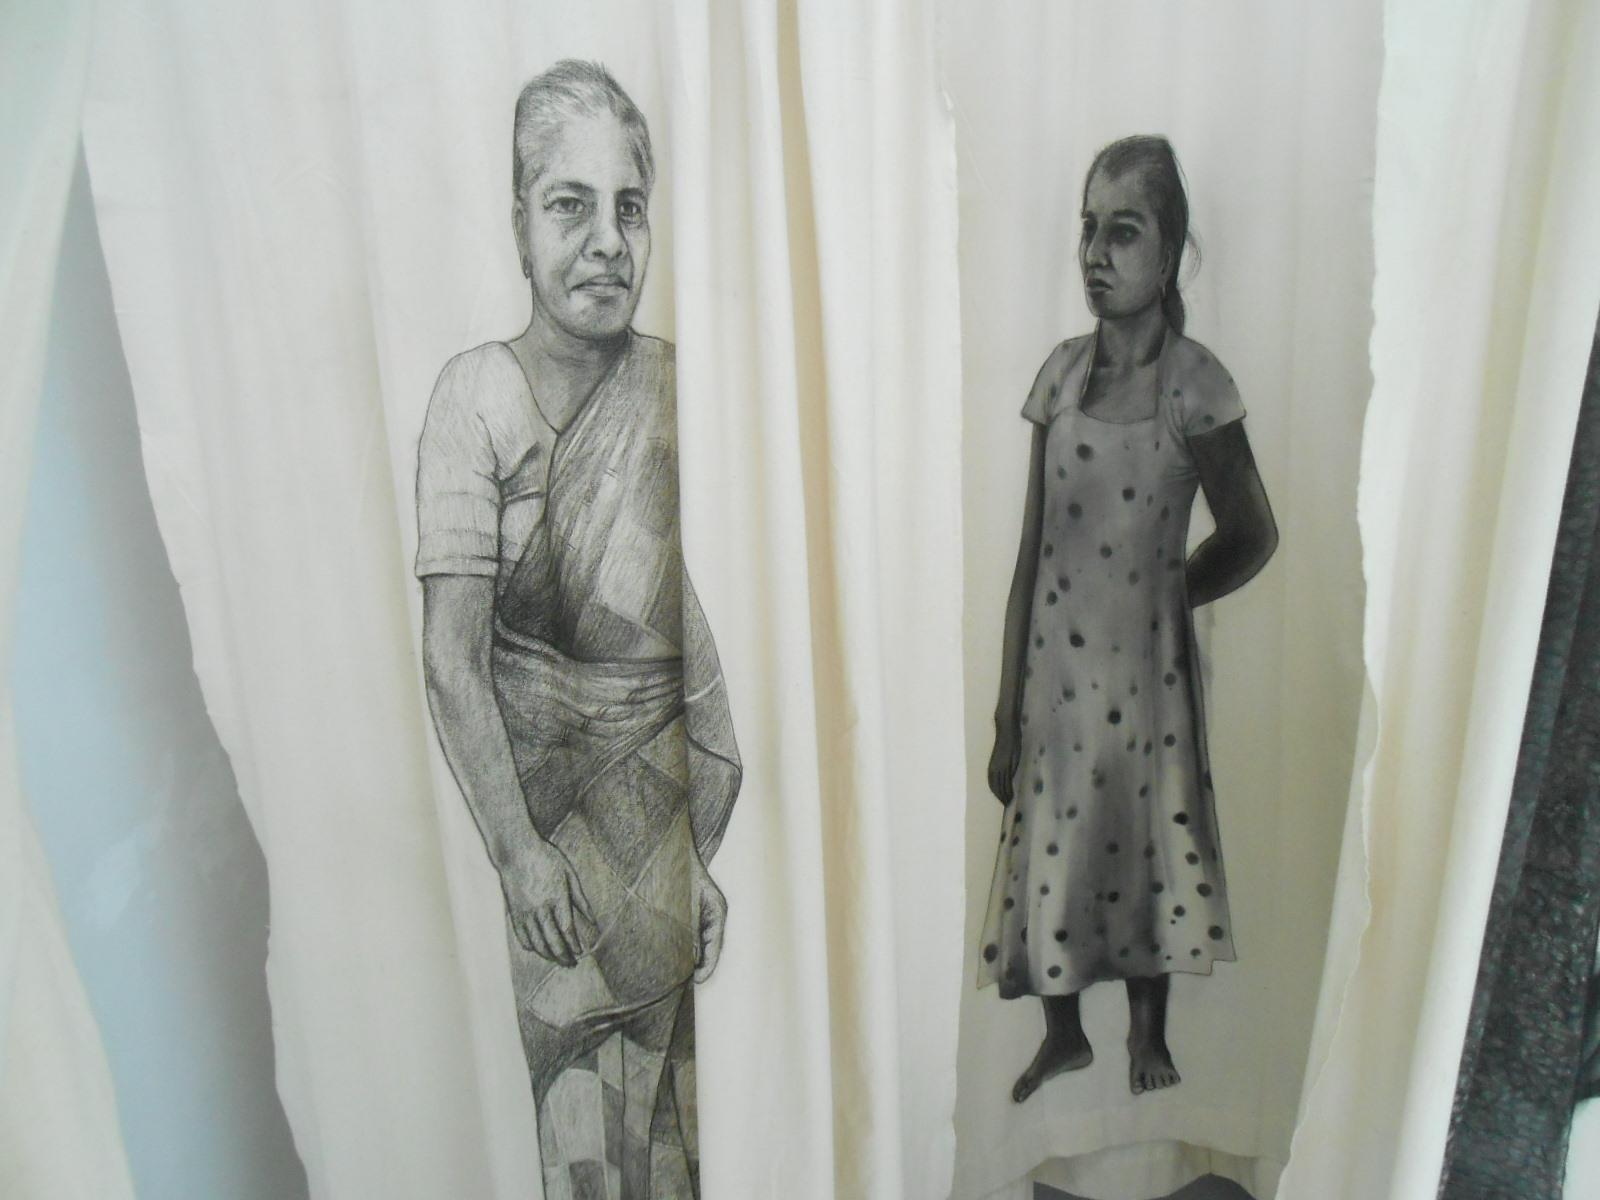 Susiman nirmalavasan Art Exhibition (2)